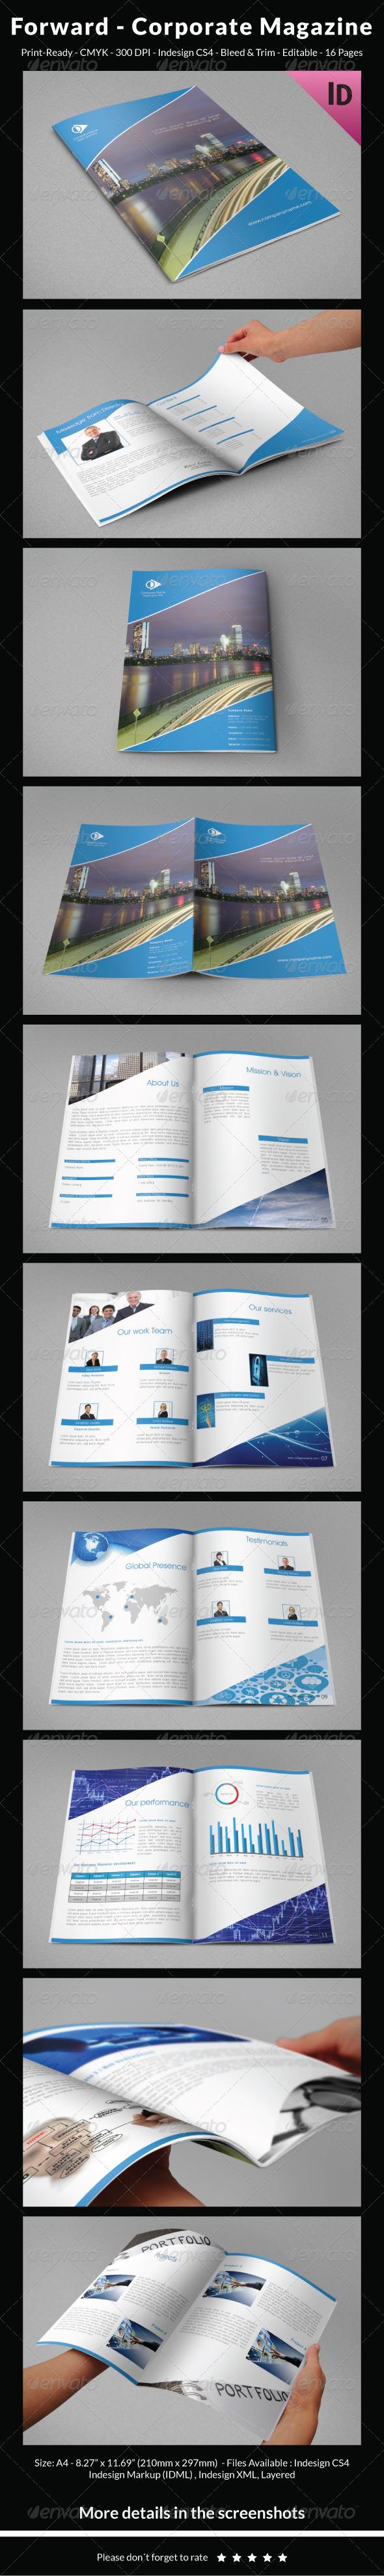 Forward - Company Magazine - Informational Brochures